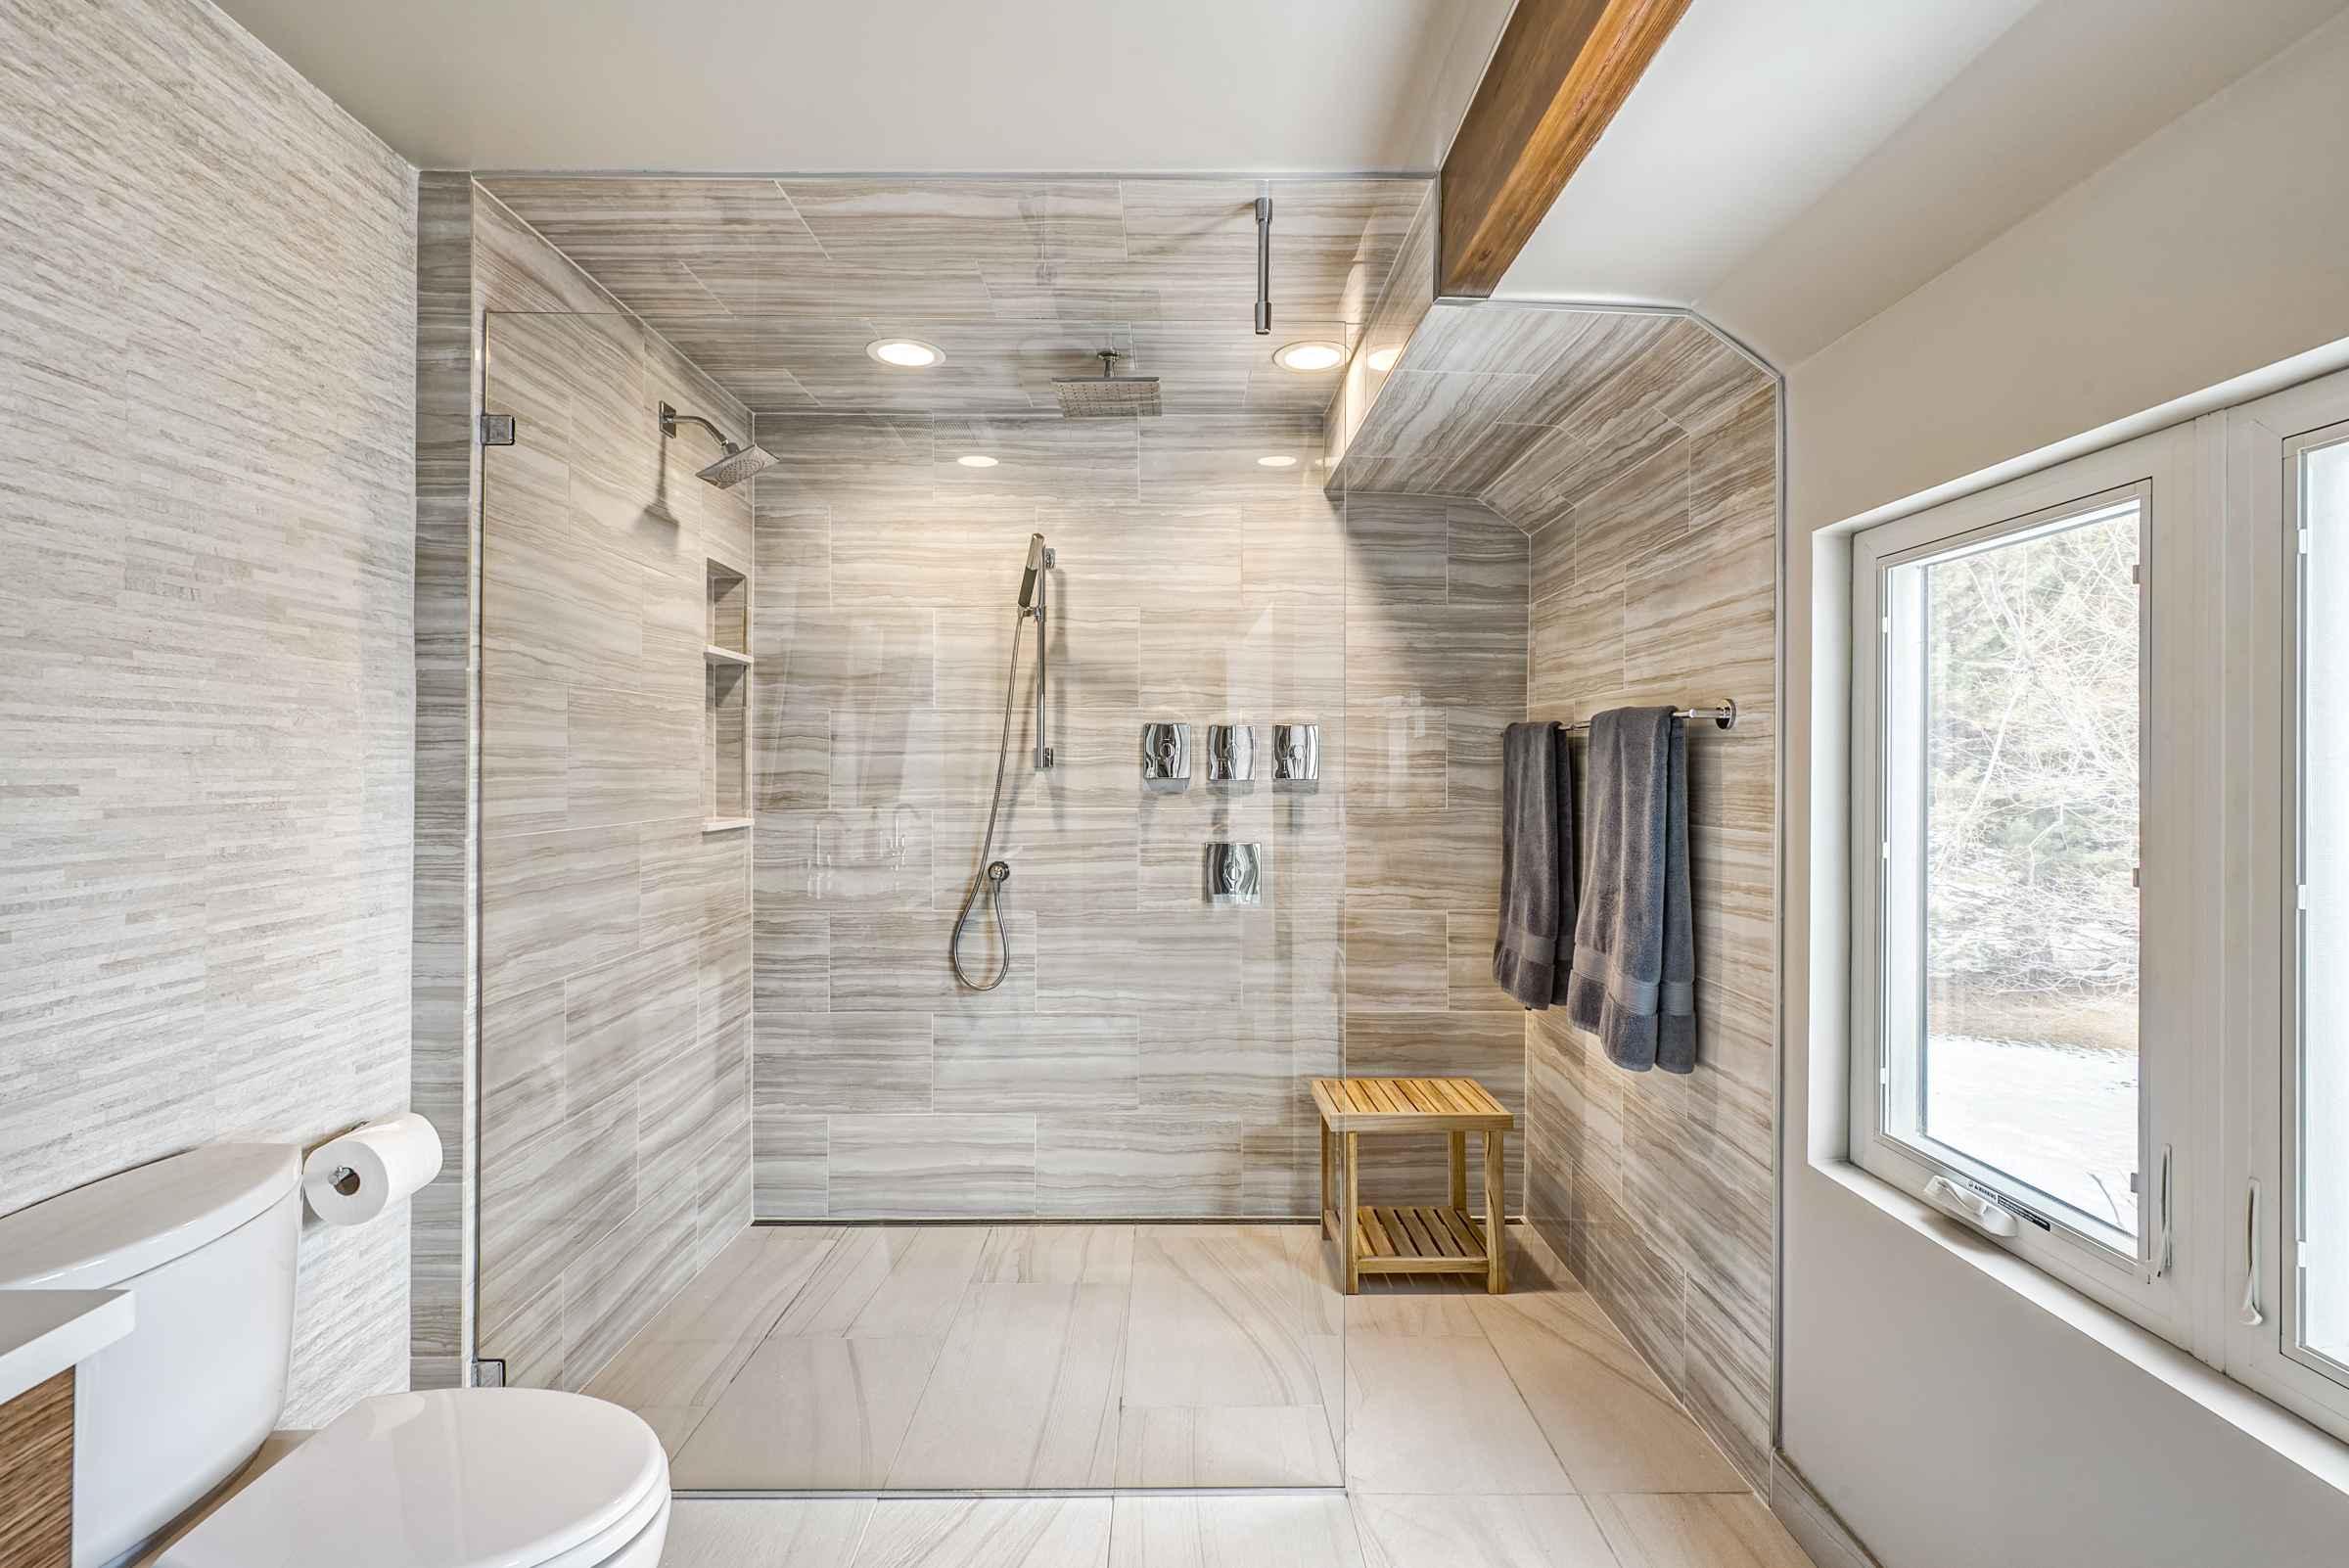 oasis — sanctuary kitchen and bath design-1.jpg